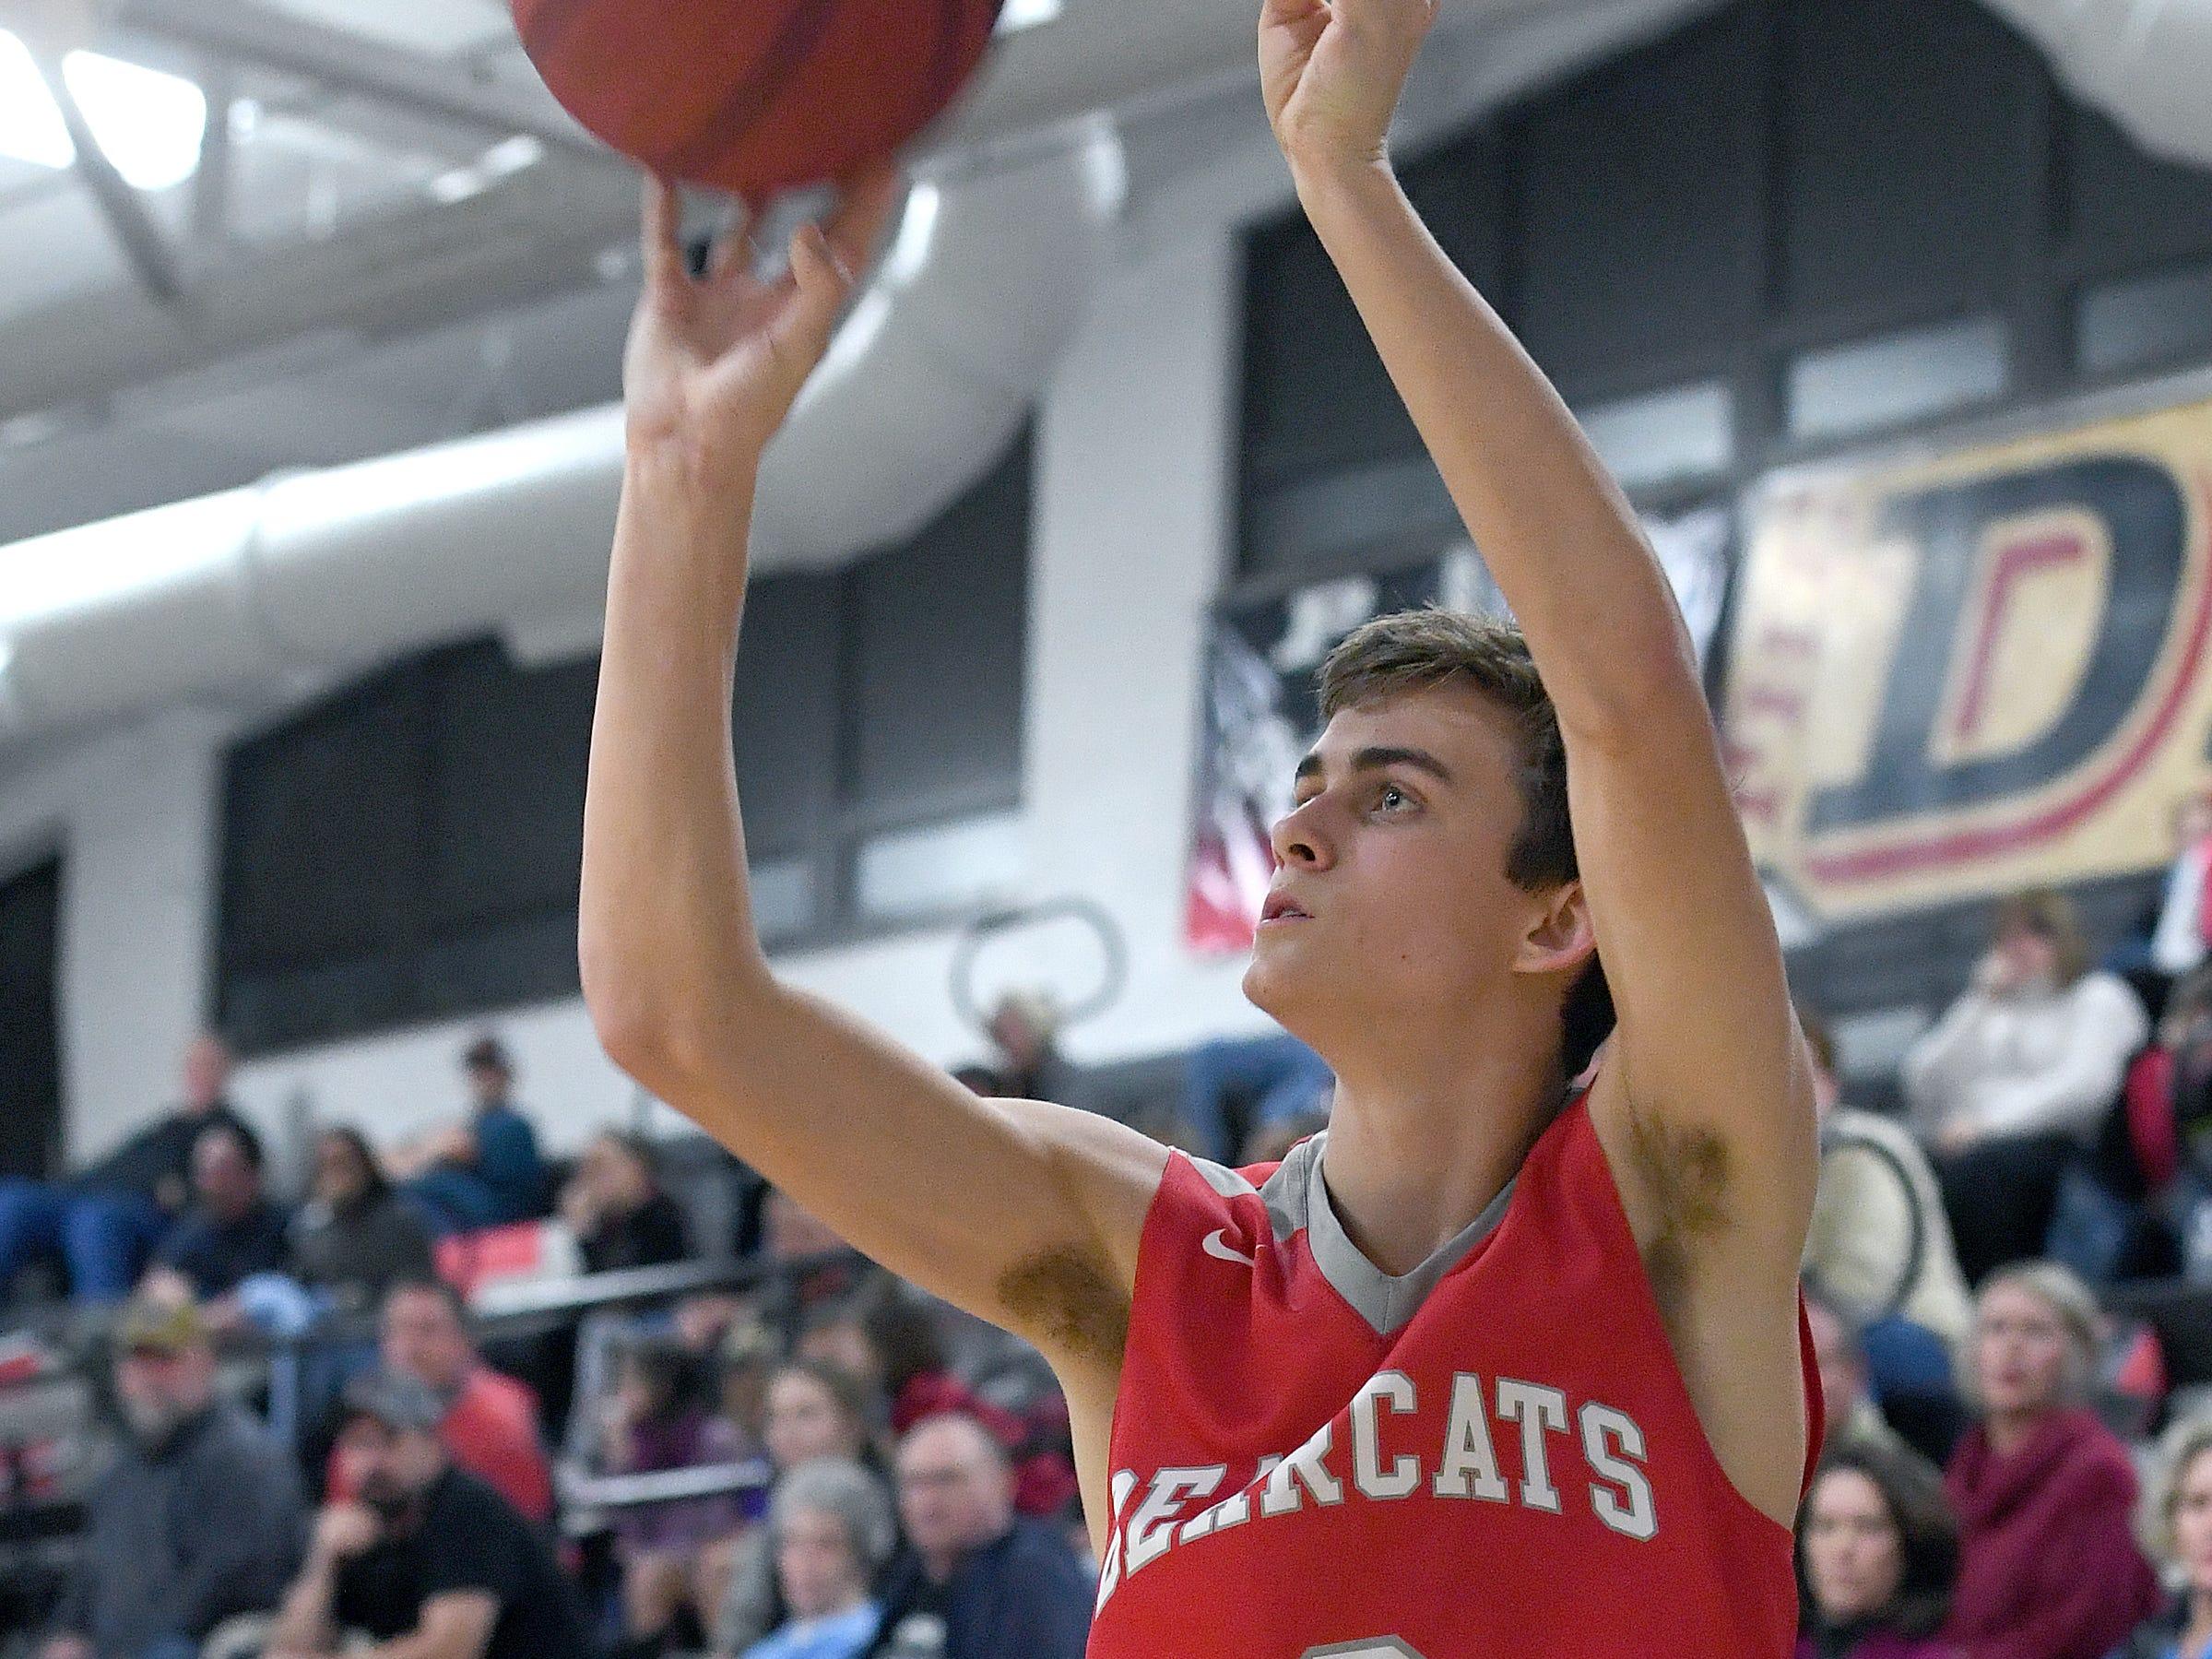 WNC high school basketball: Local teams ranked in media poll